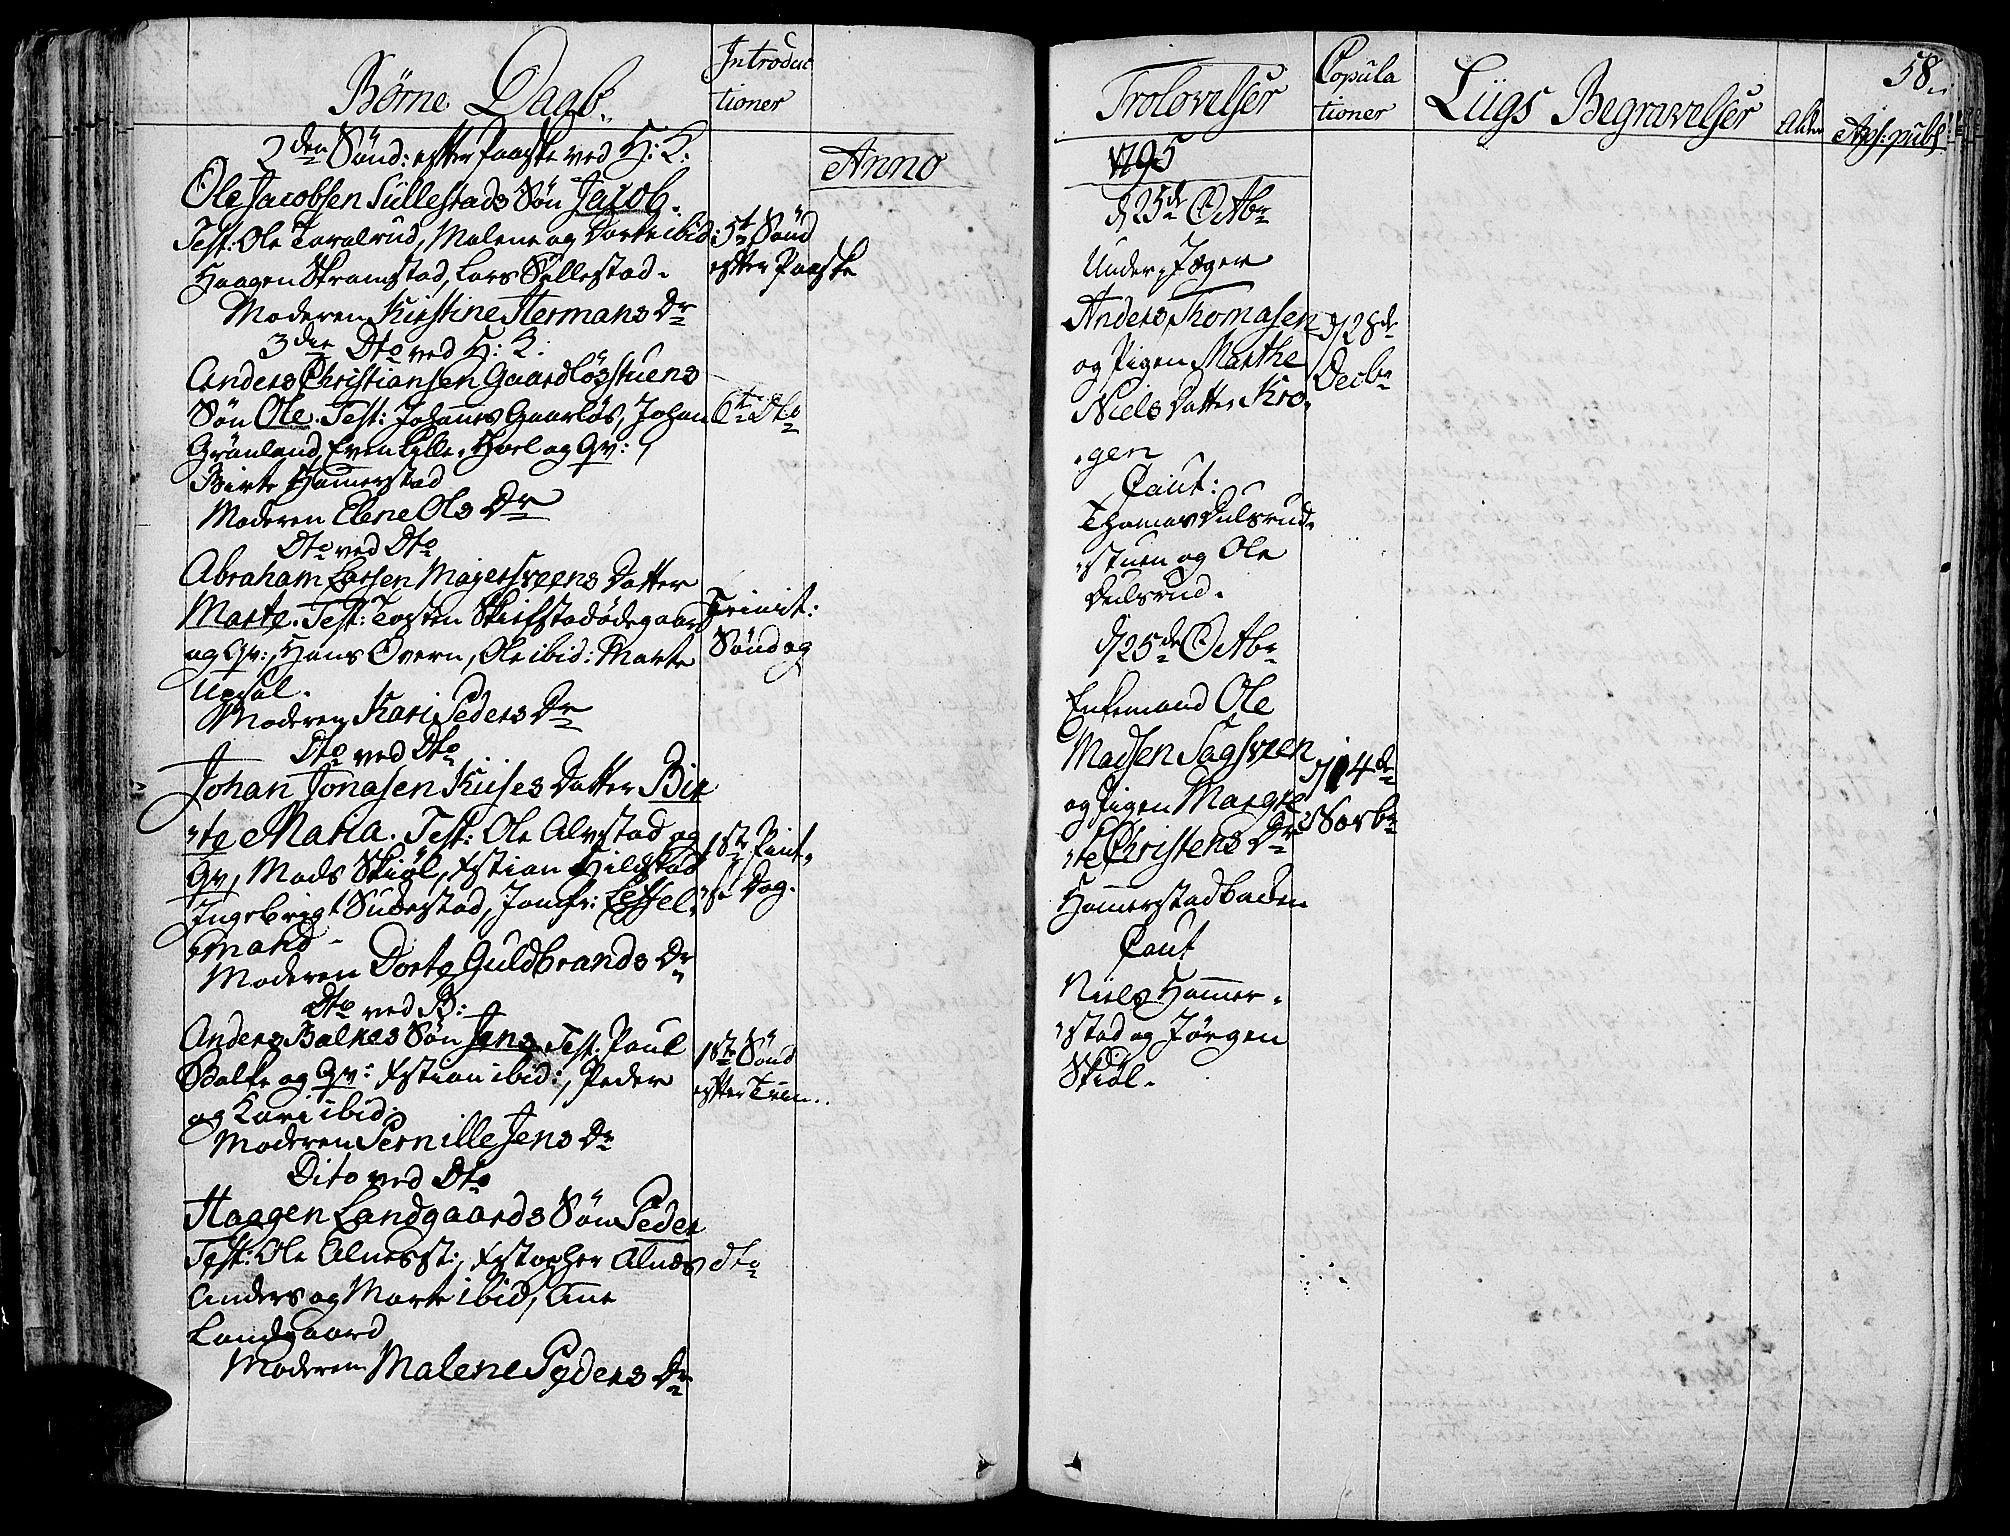 SAH, Toten prestekontor, Ministerialbok nr. 7, 1794-1809, s. 58